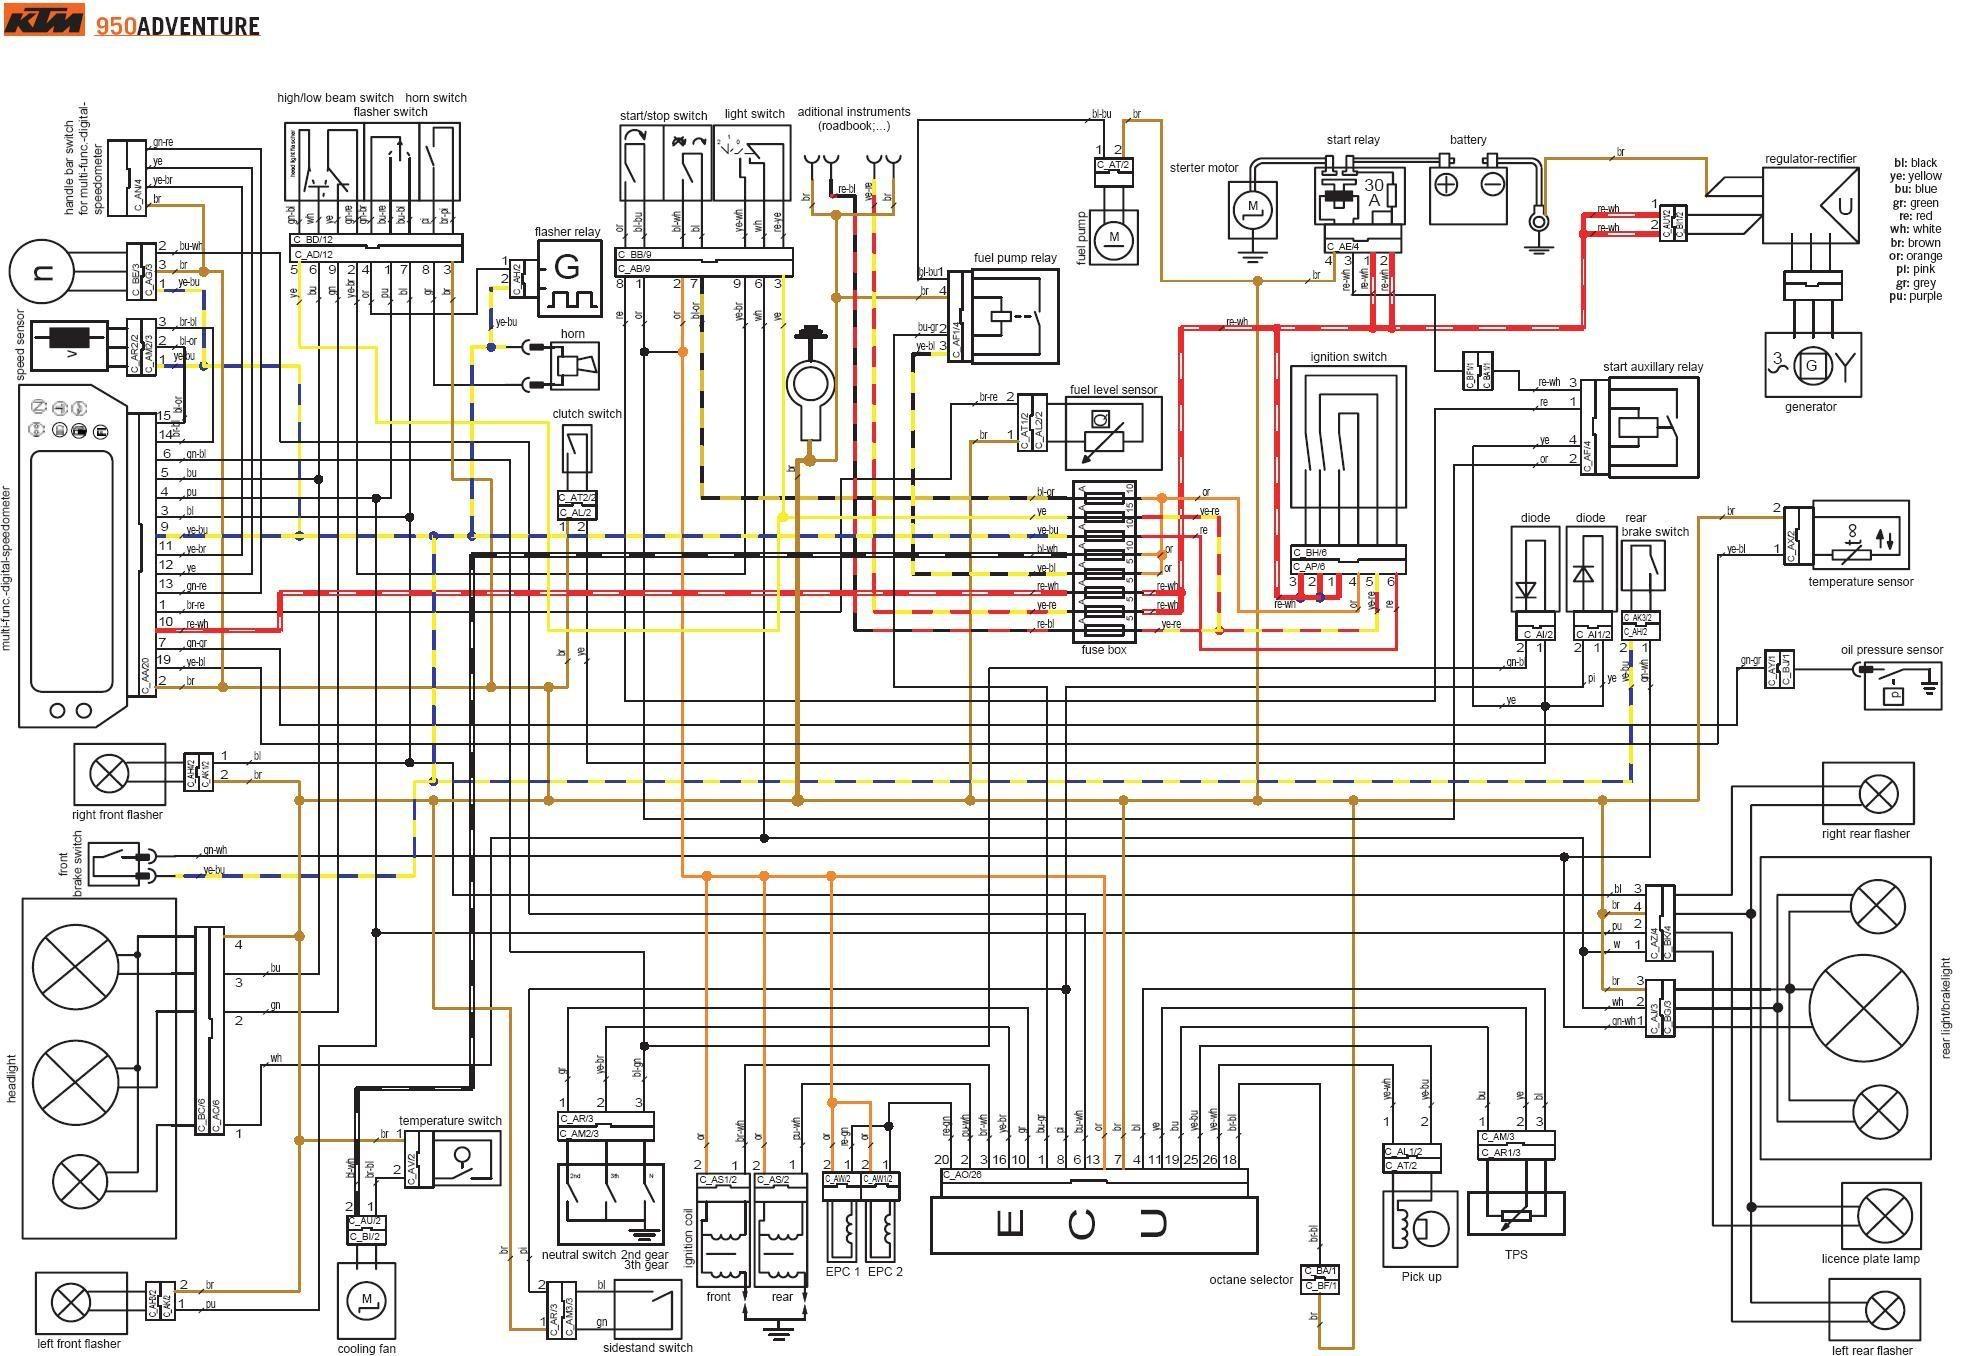 Motorcycle Electrical Diagram Modern Honda Vfr800 Wiring Diagram Pattern Electrical Diagram Of Motorcycle Electrical Diagram